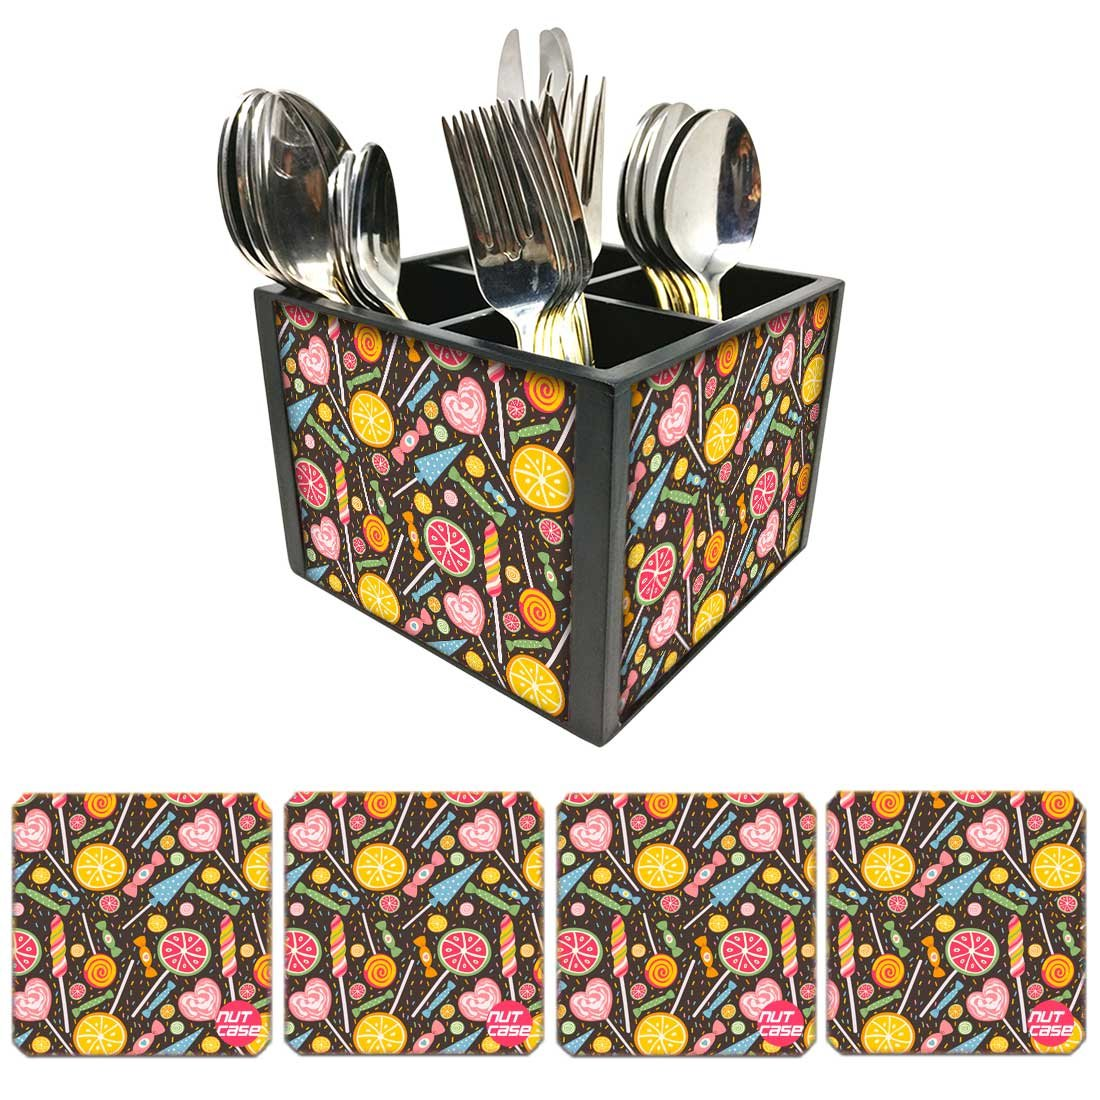 Nutcase Designer FlatwareカトラリースタンドホルダーSilverware caddy-spoonsフォークナイフOrganizer with Matchingメタルコースター – レモンとキャンディ   B07DC897BY